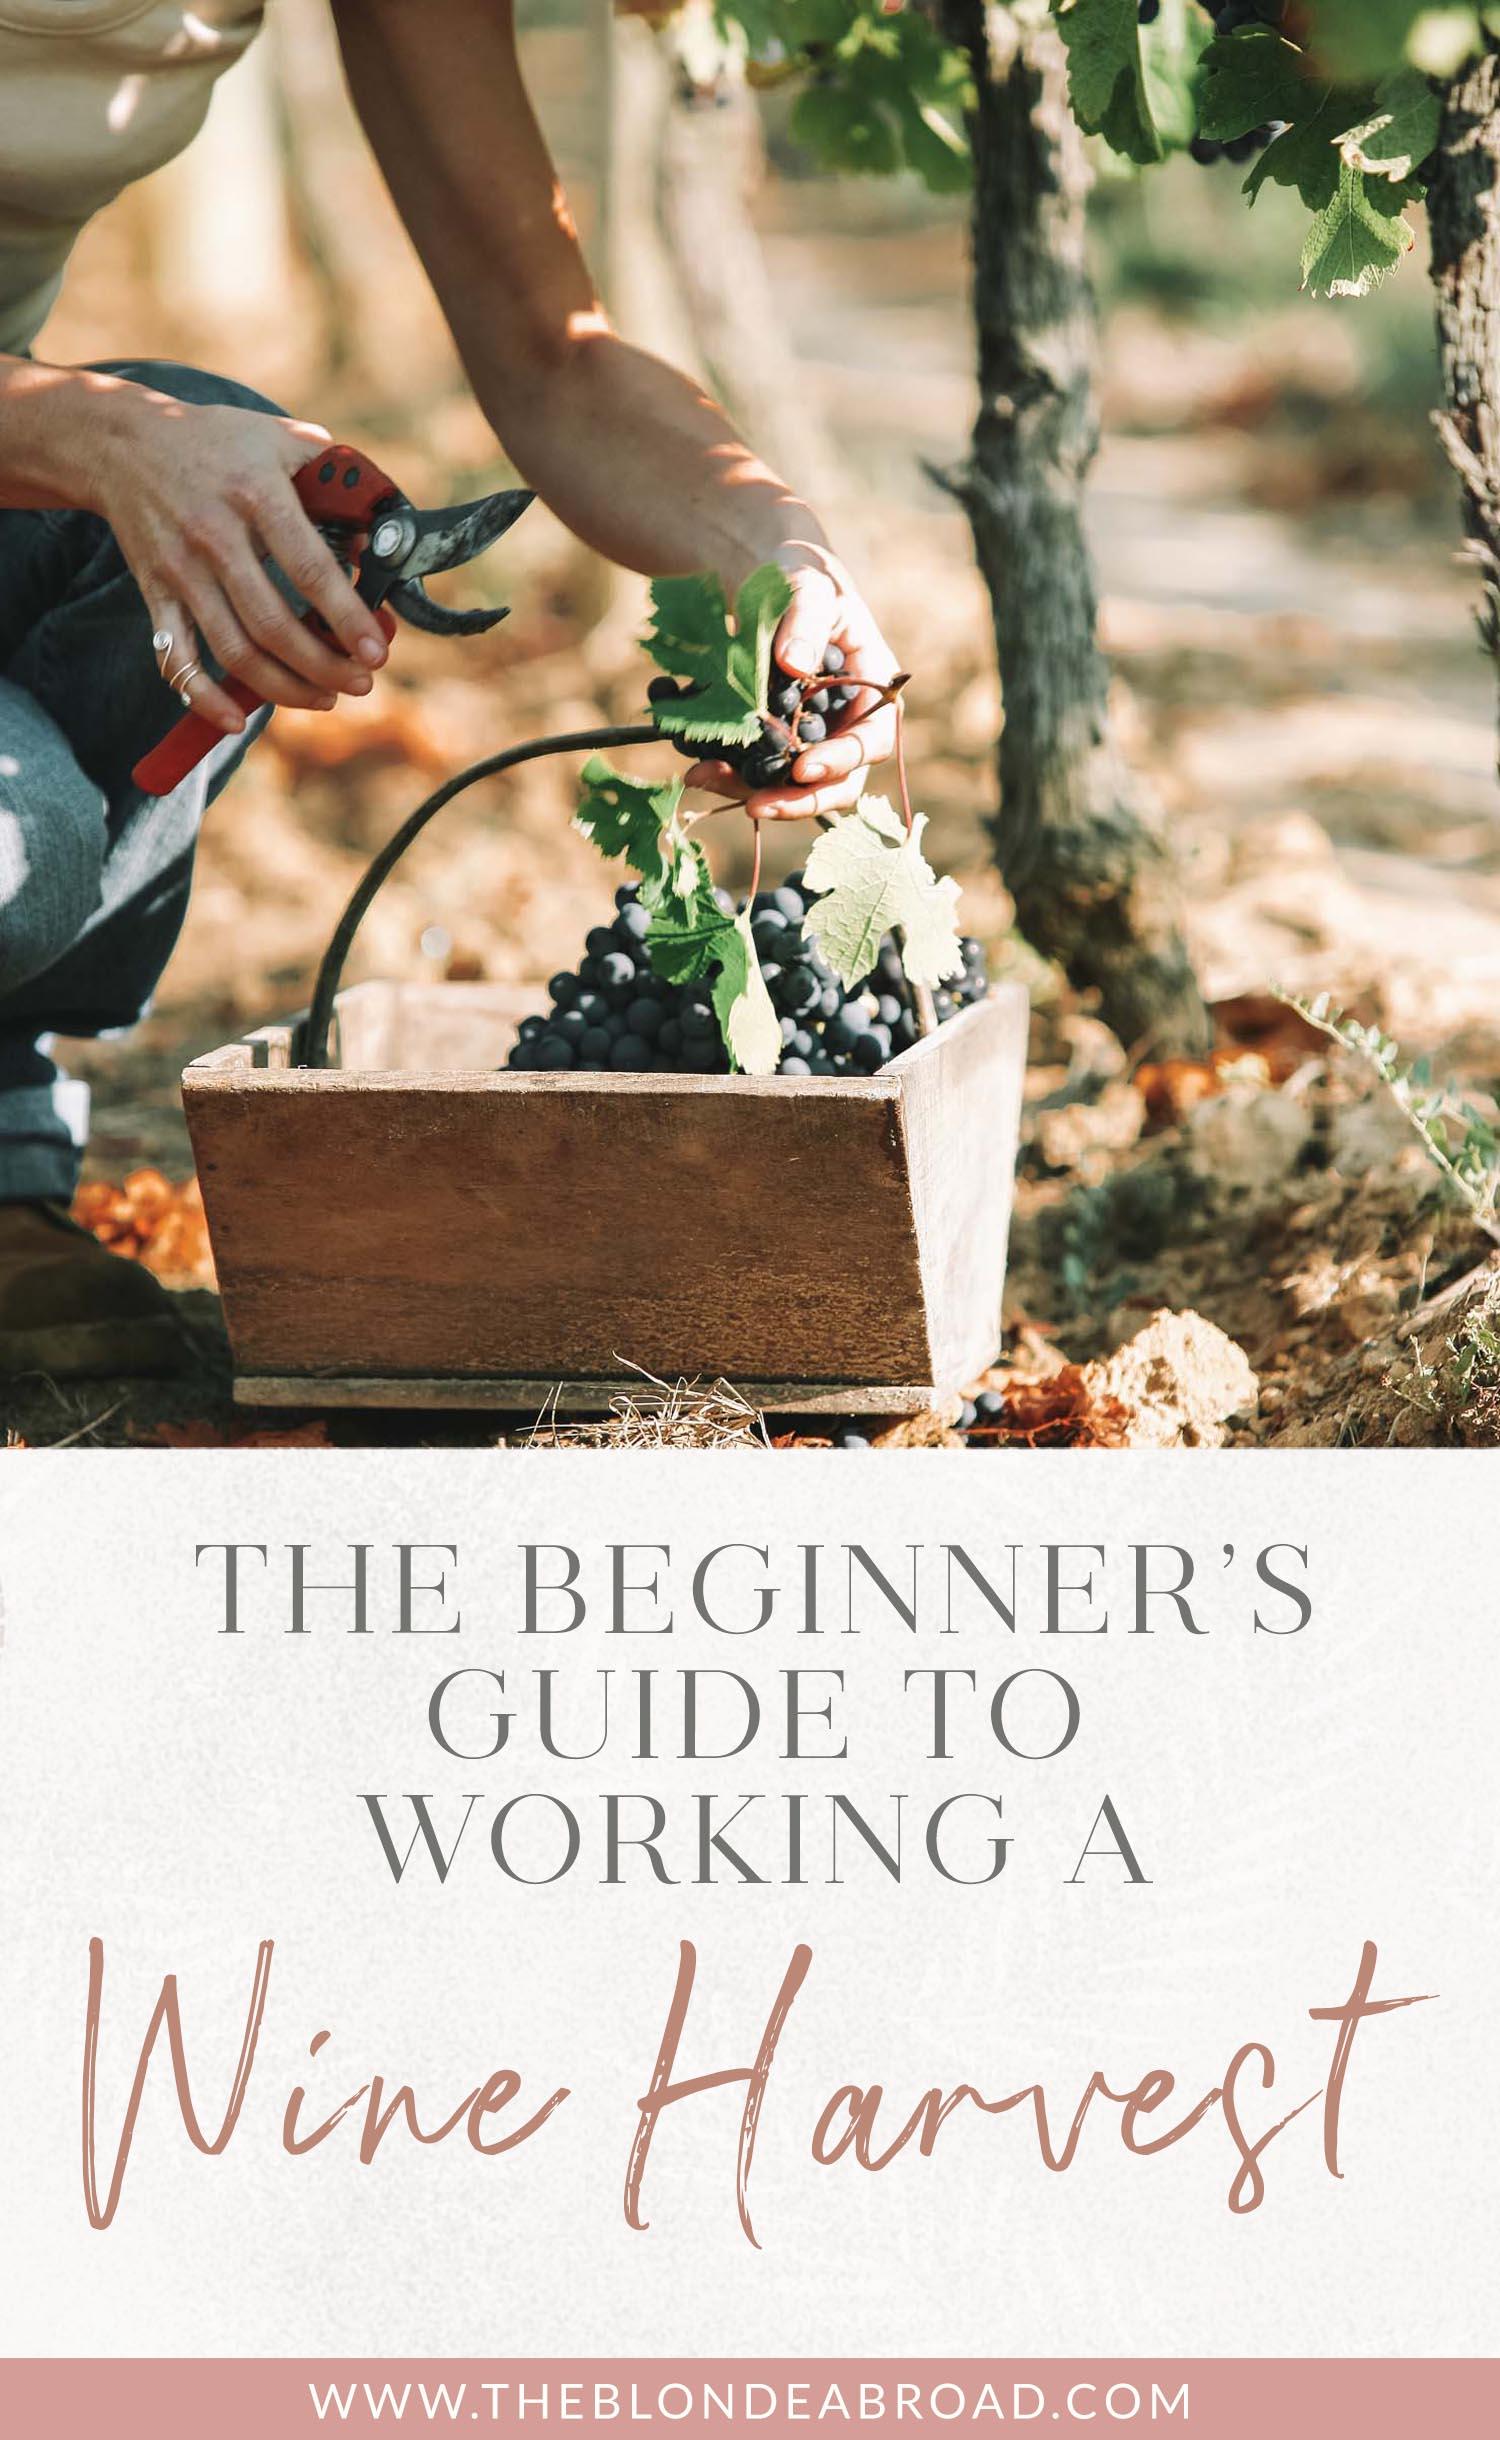 Guide du débutant Working Wine Harvest